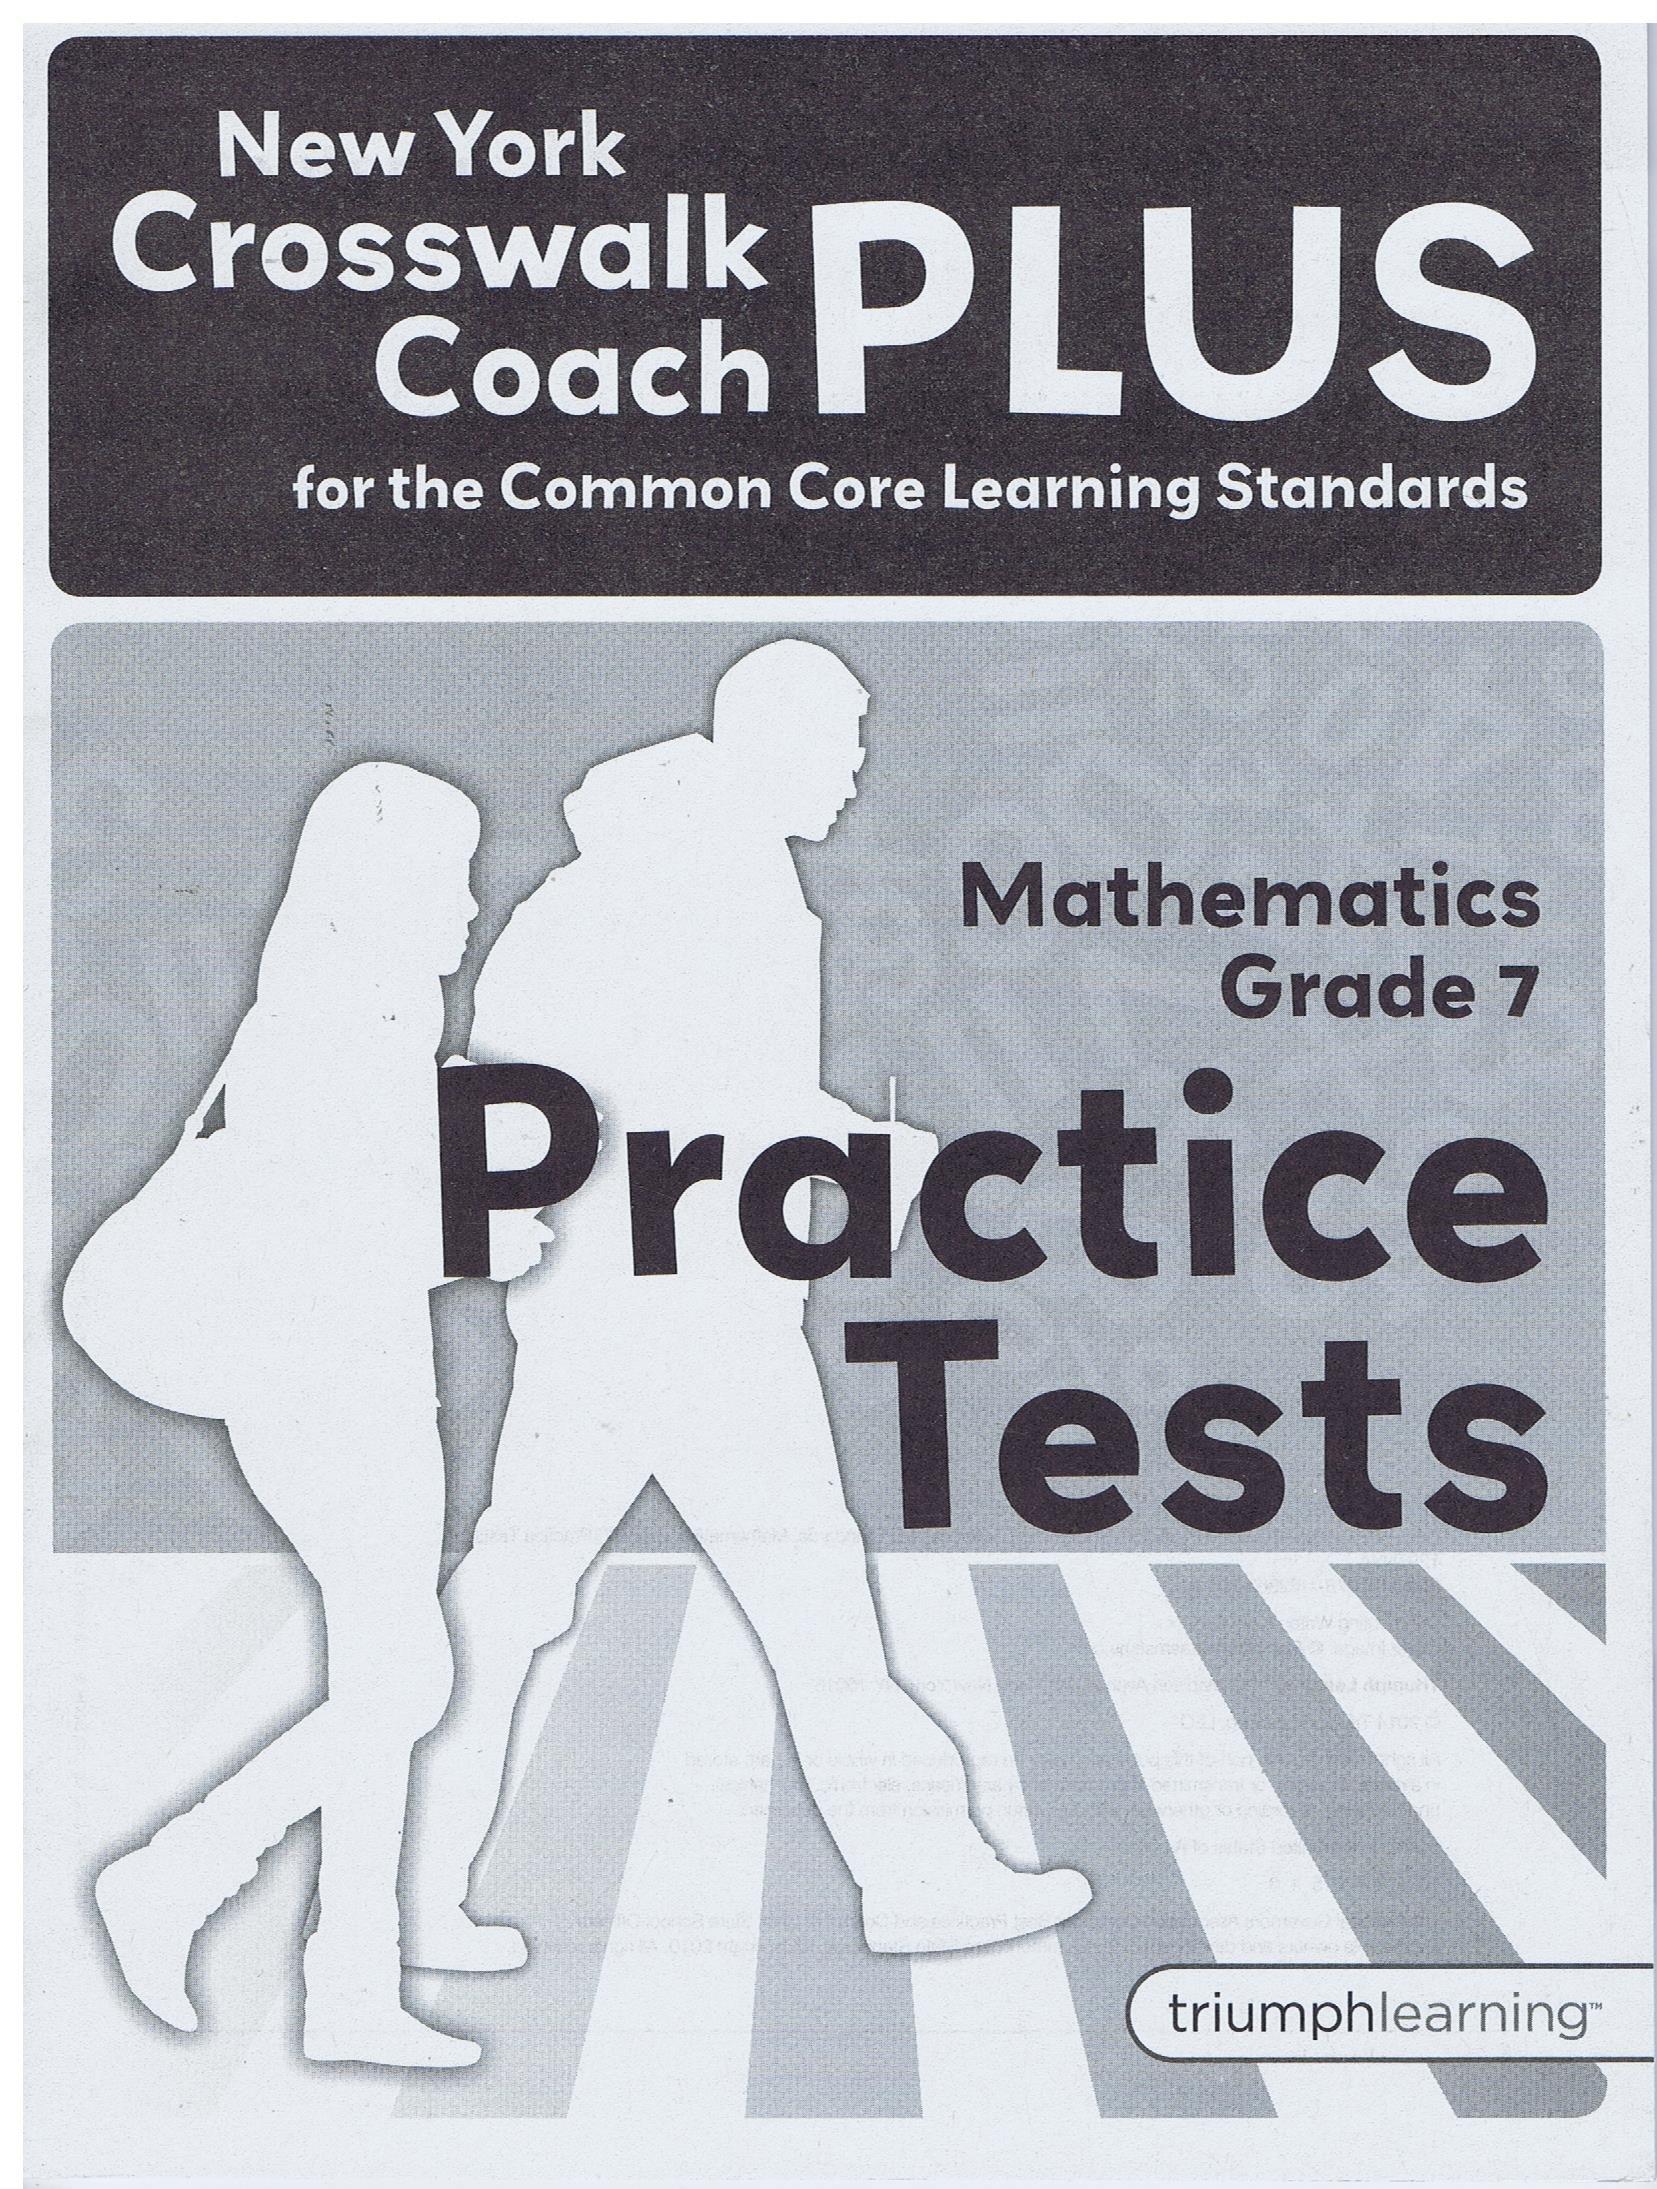 New York Crosswalk Coach Plus Practice tests grade 7 Math ebook